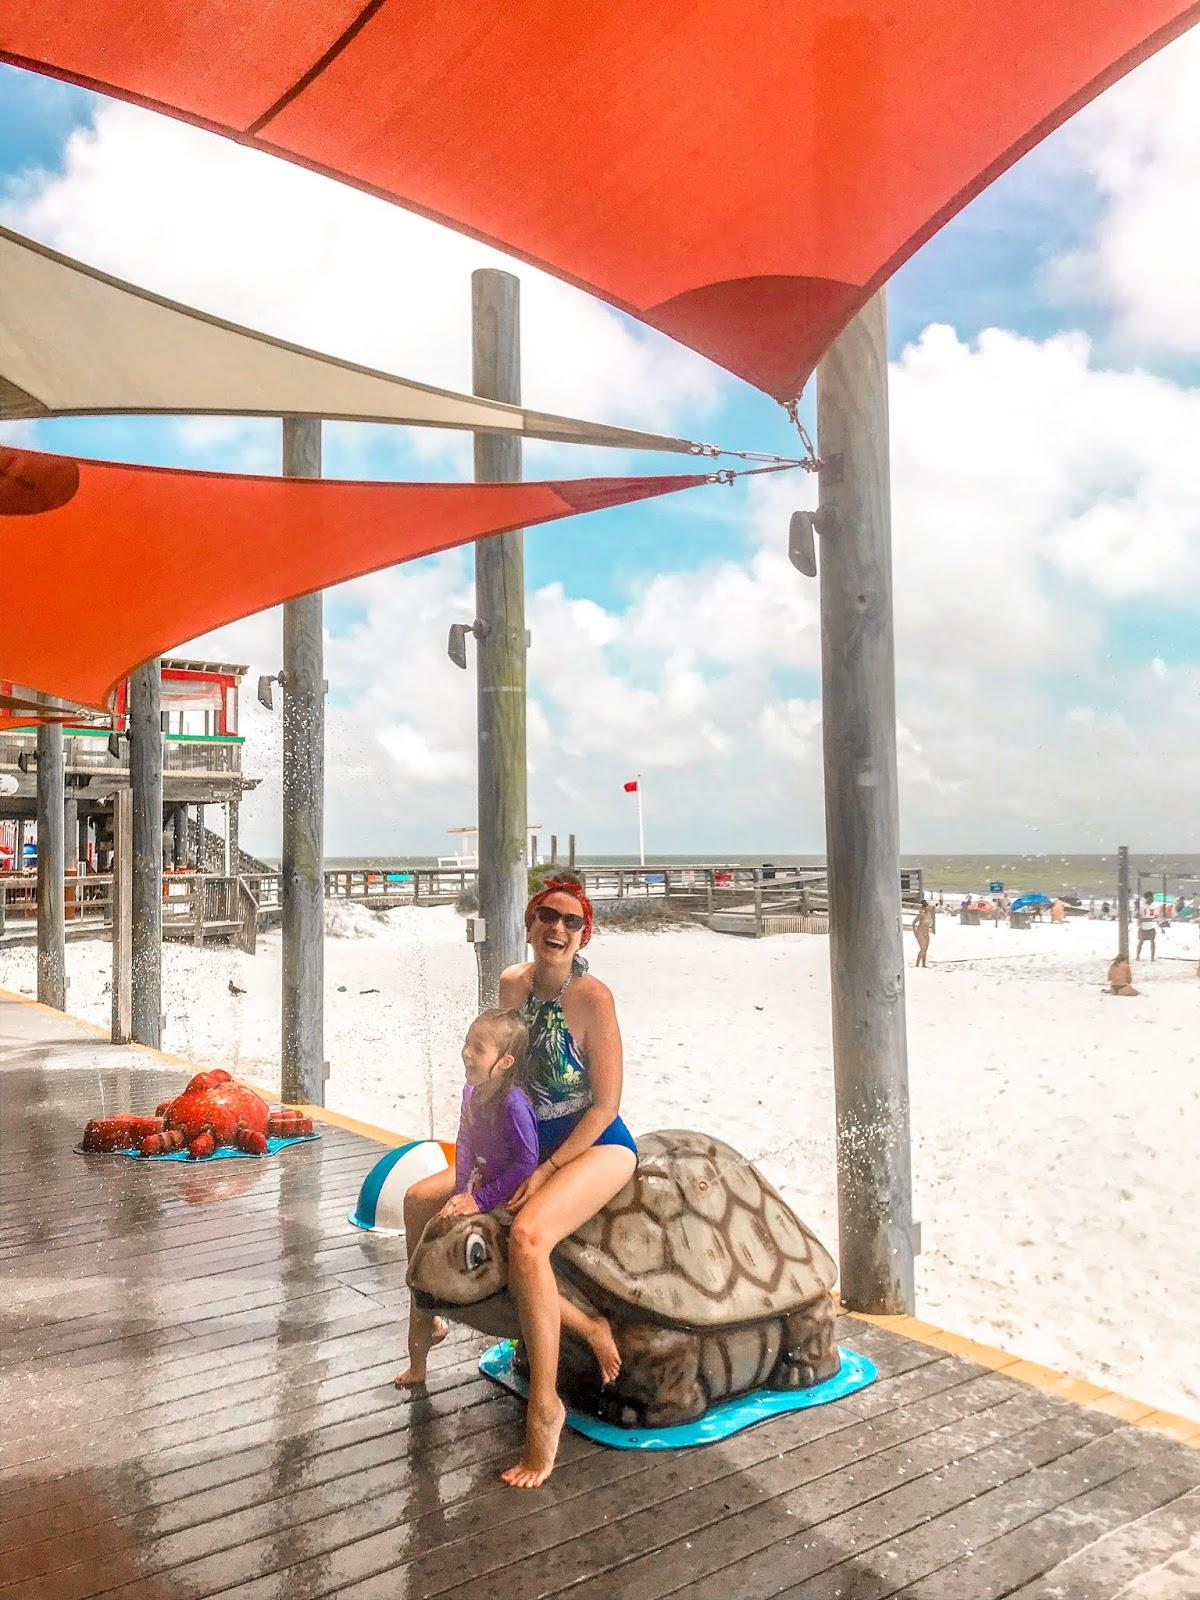 Al's Beach Club Splash Pad